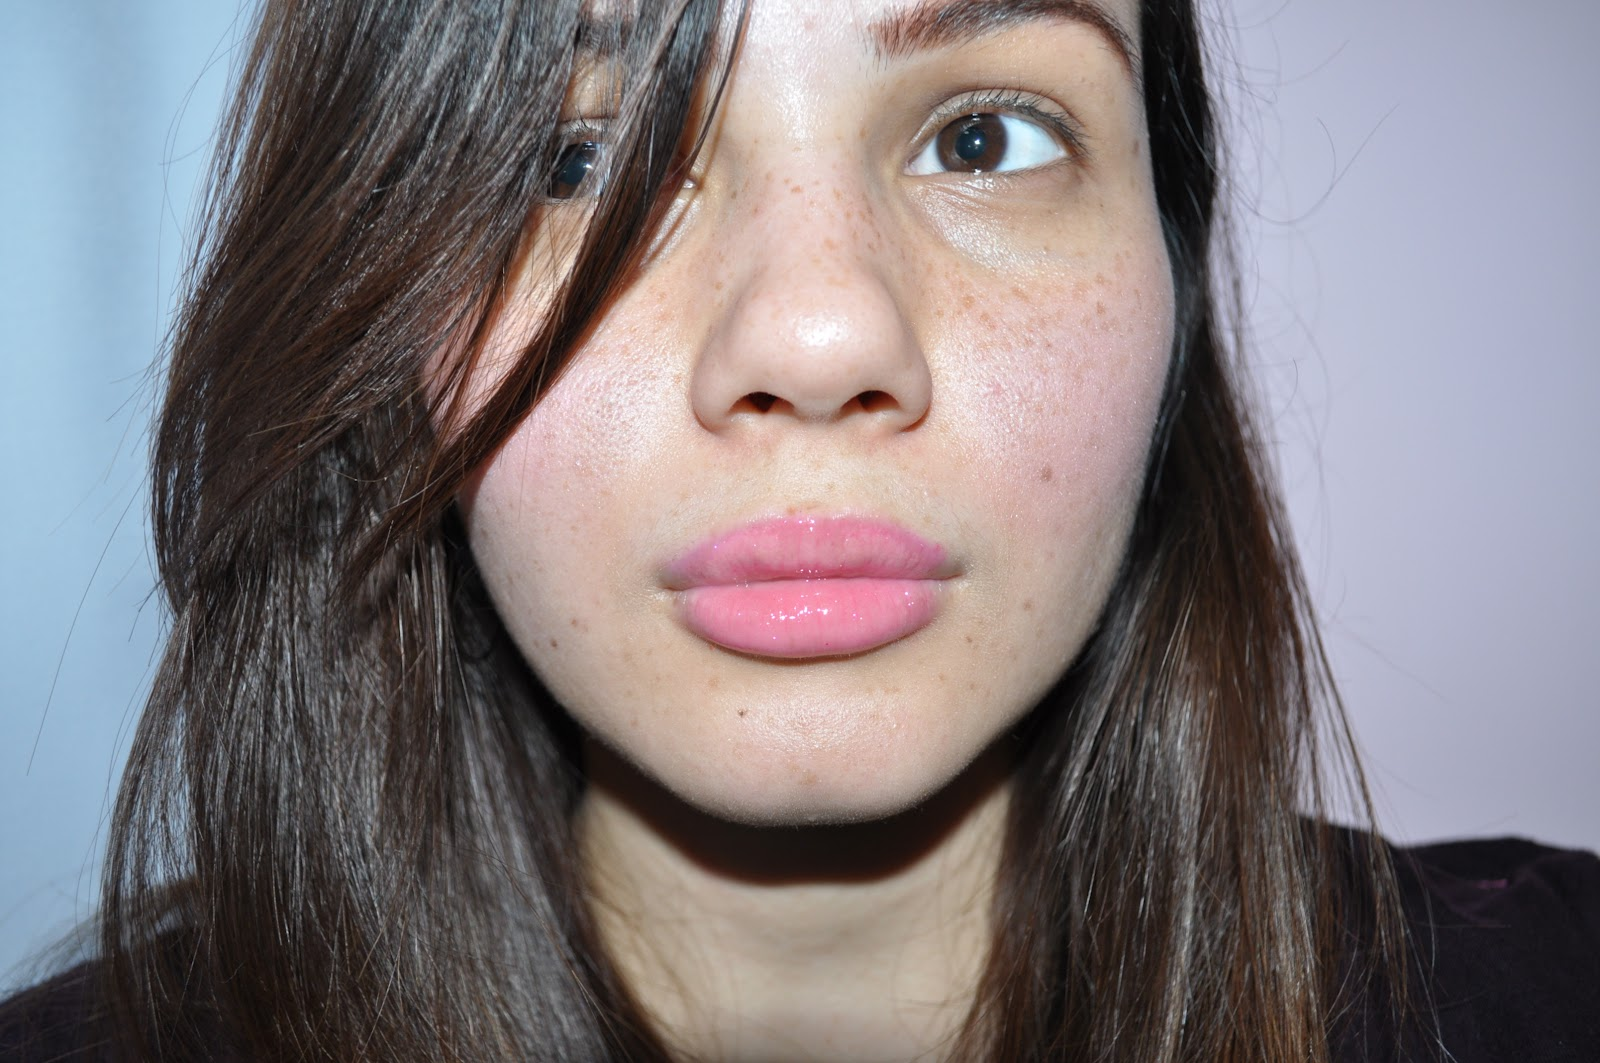 Facial lip, nude teen booty close up